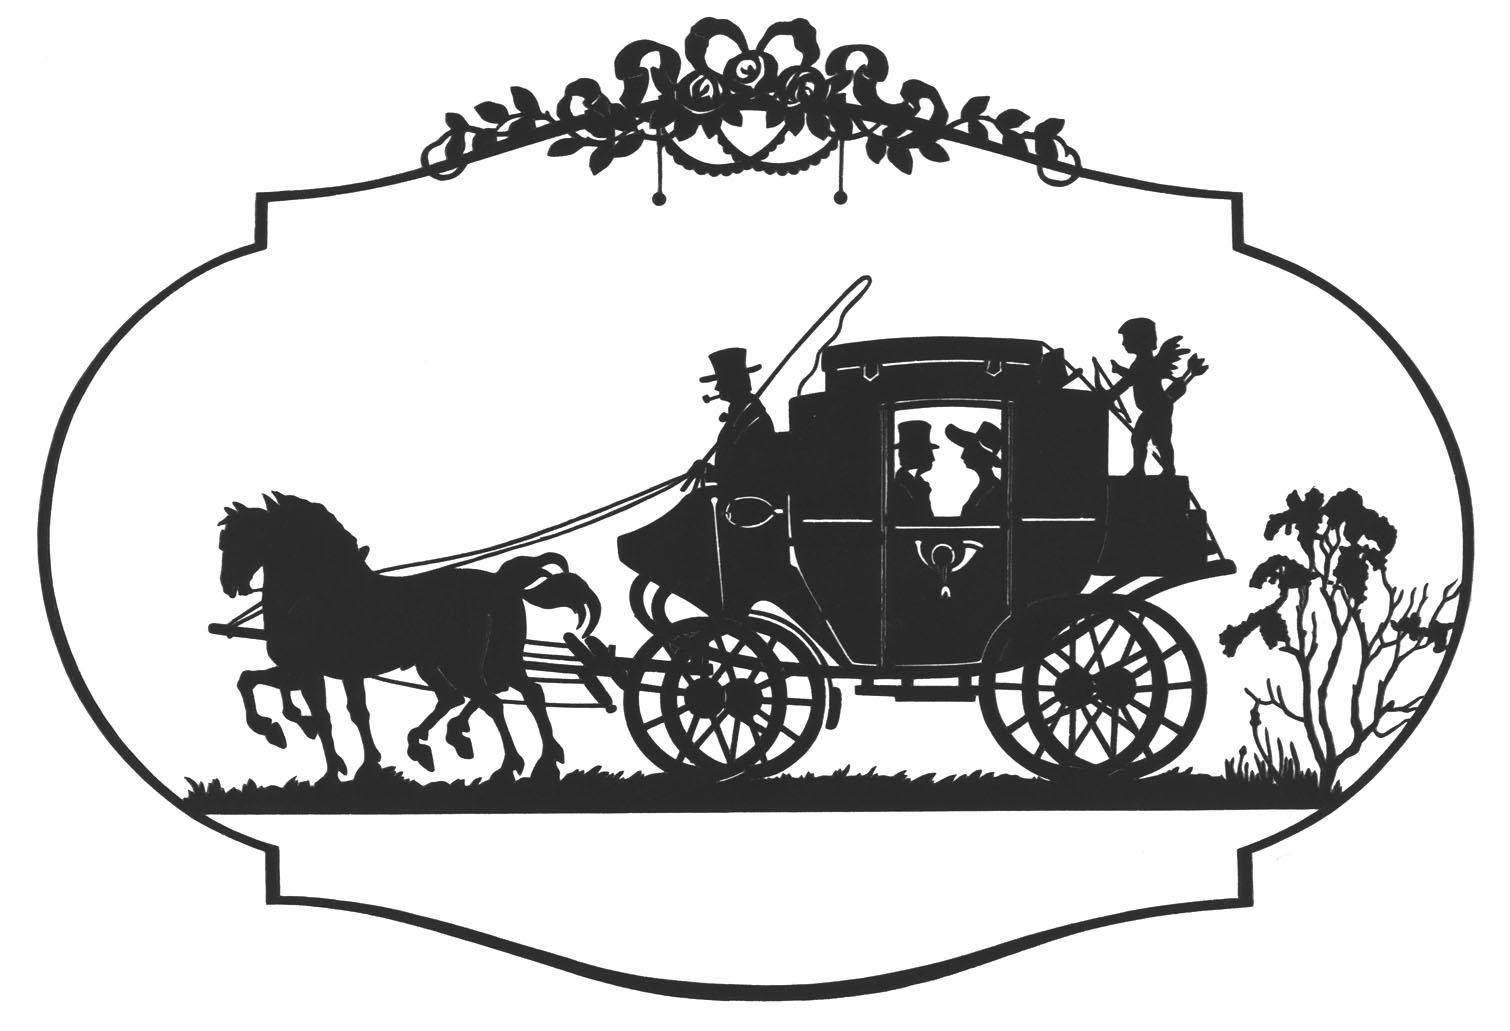 Coffin clipart horse drawn sleigh Nurses Snowflake Horse Day Thursday